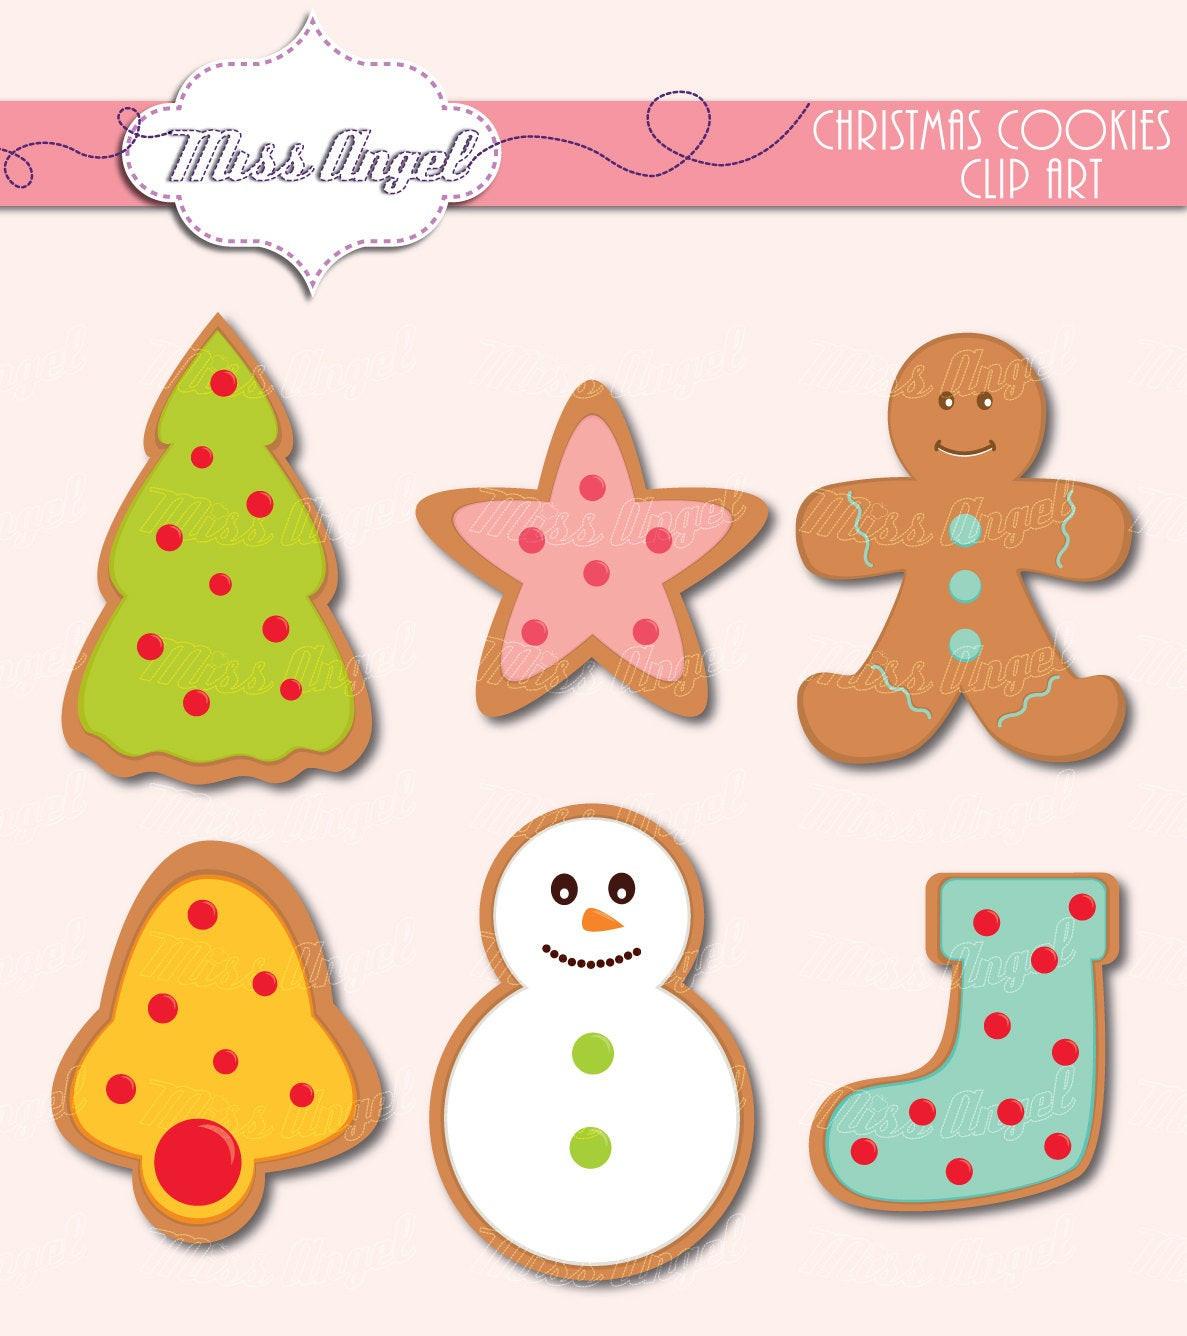 Christmas Cookies Clip Art  Christmas Cookies Clip Art 6 Digital Xmas Clipart 6